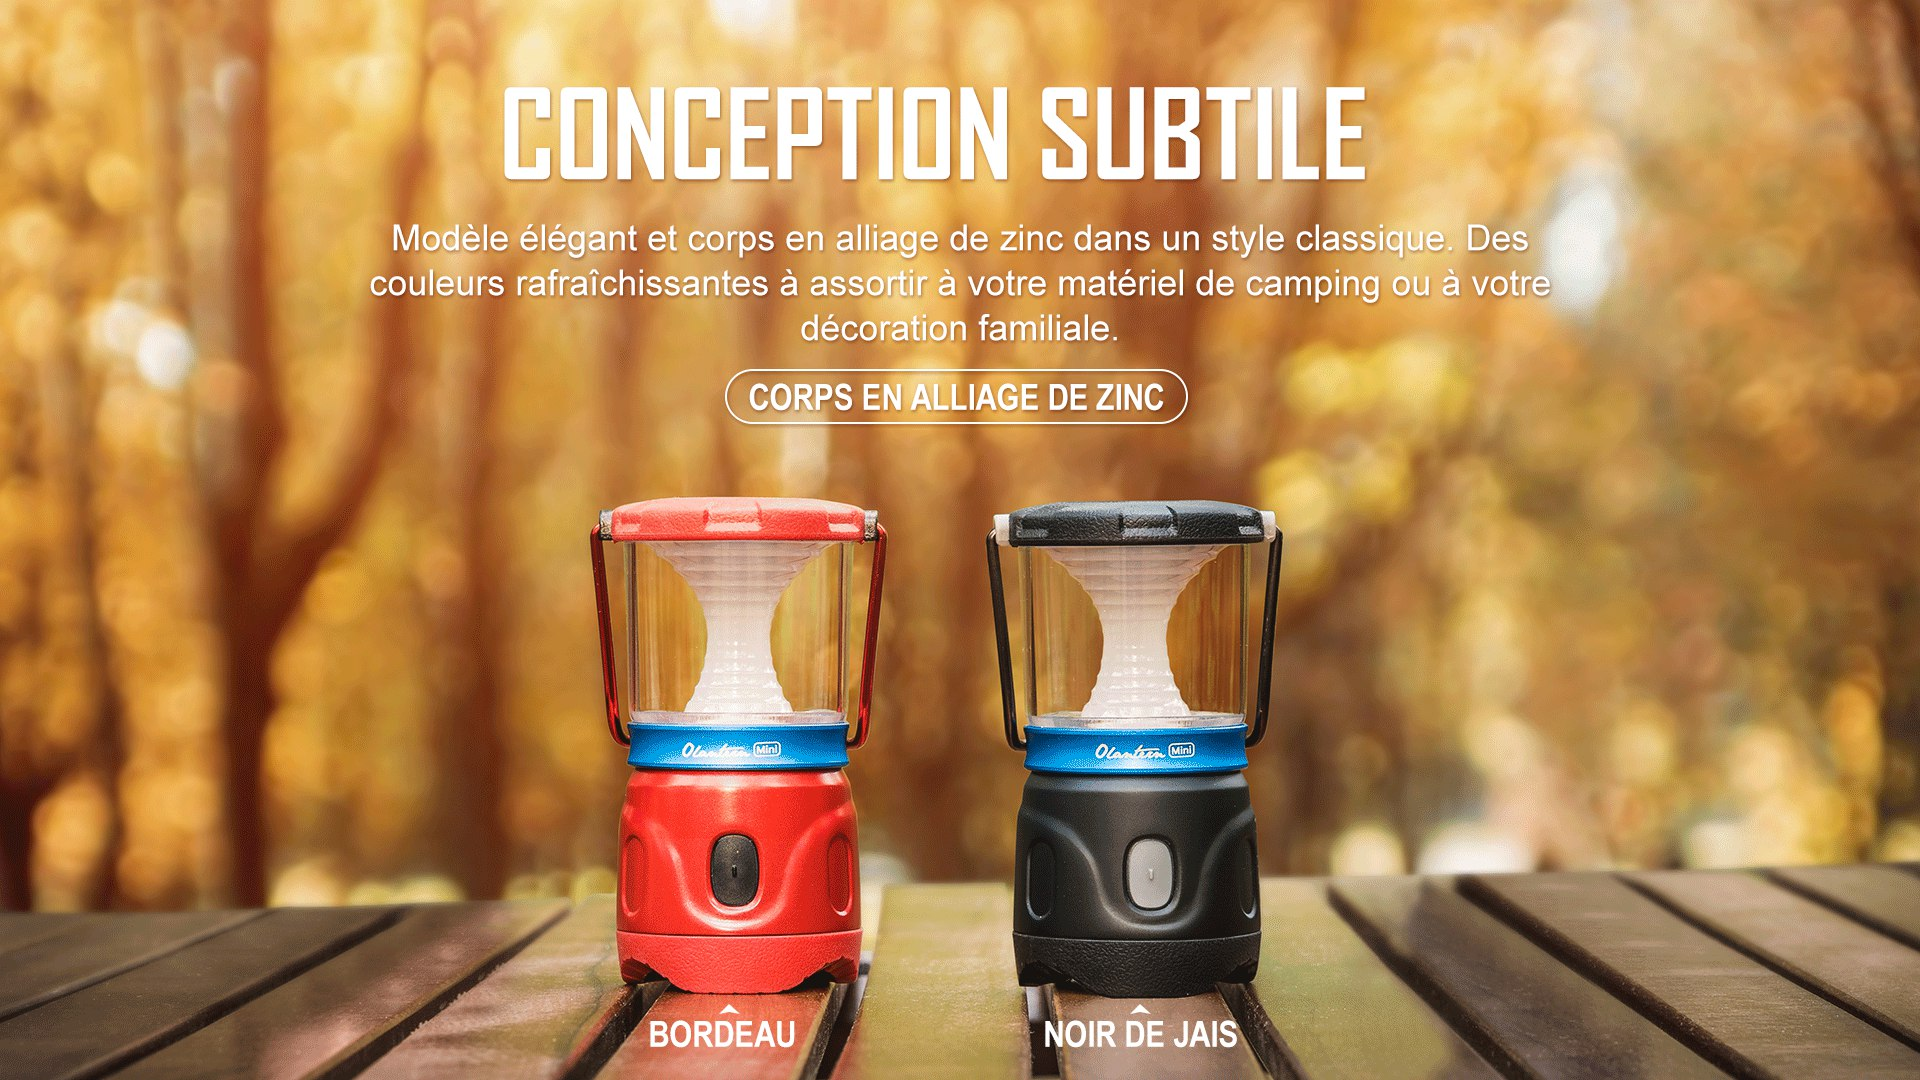 Olantern Mini lanterne de camping est délicieusement conçu